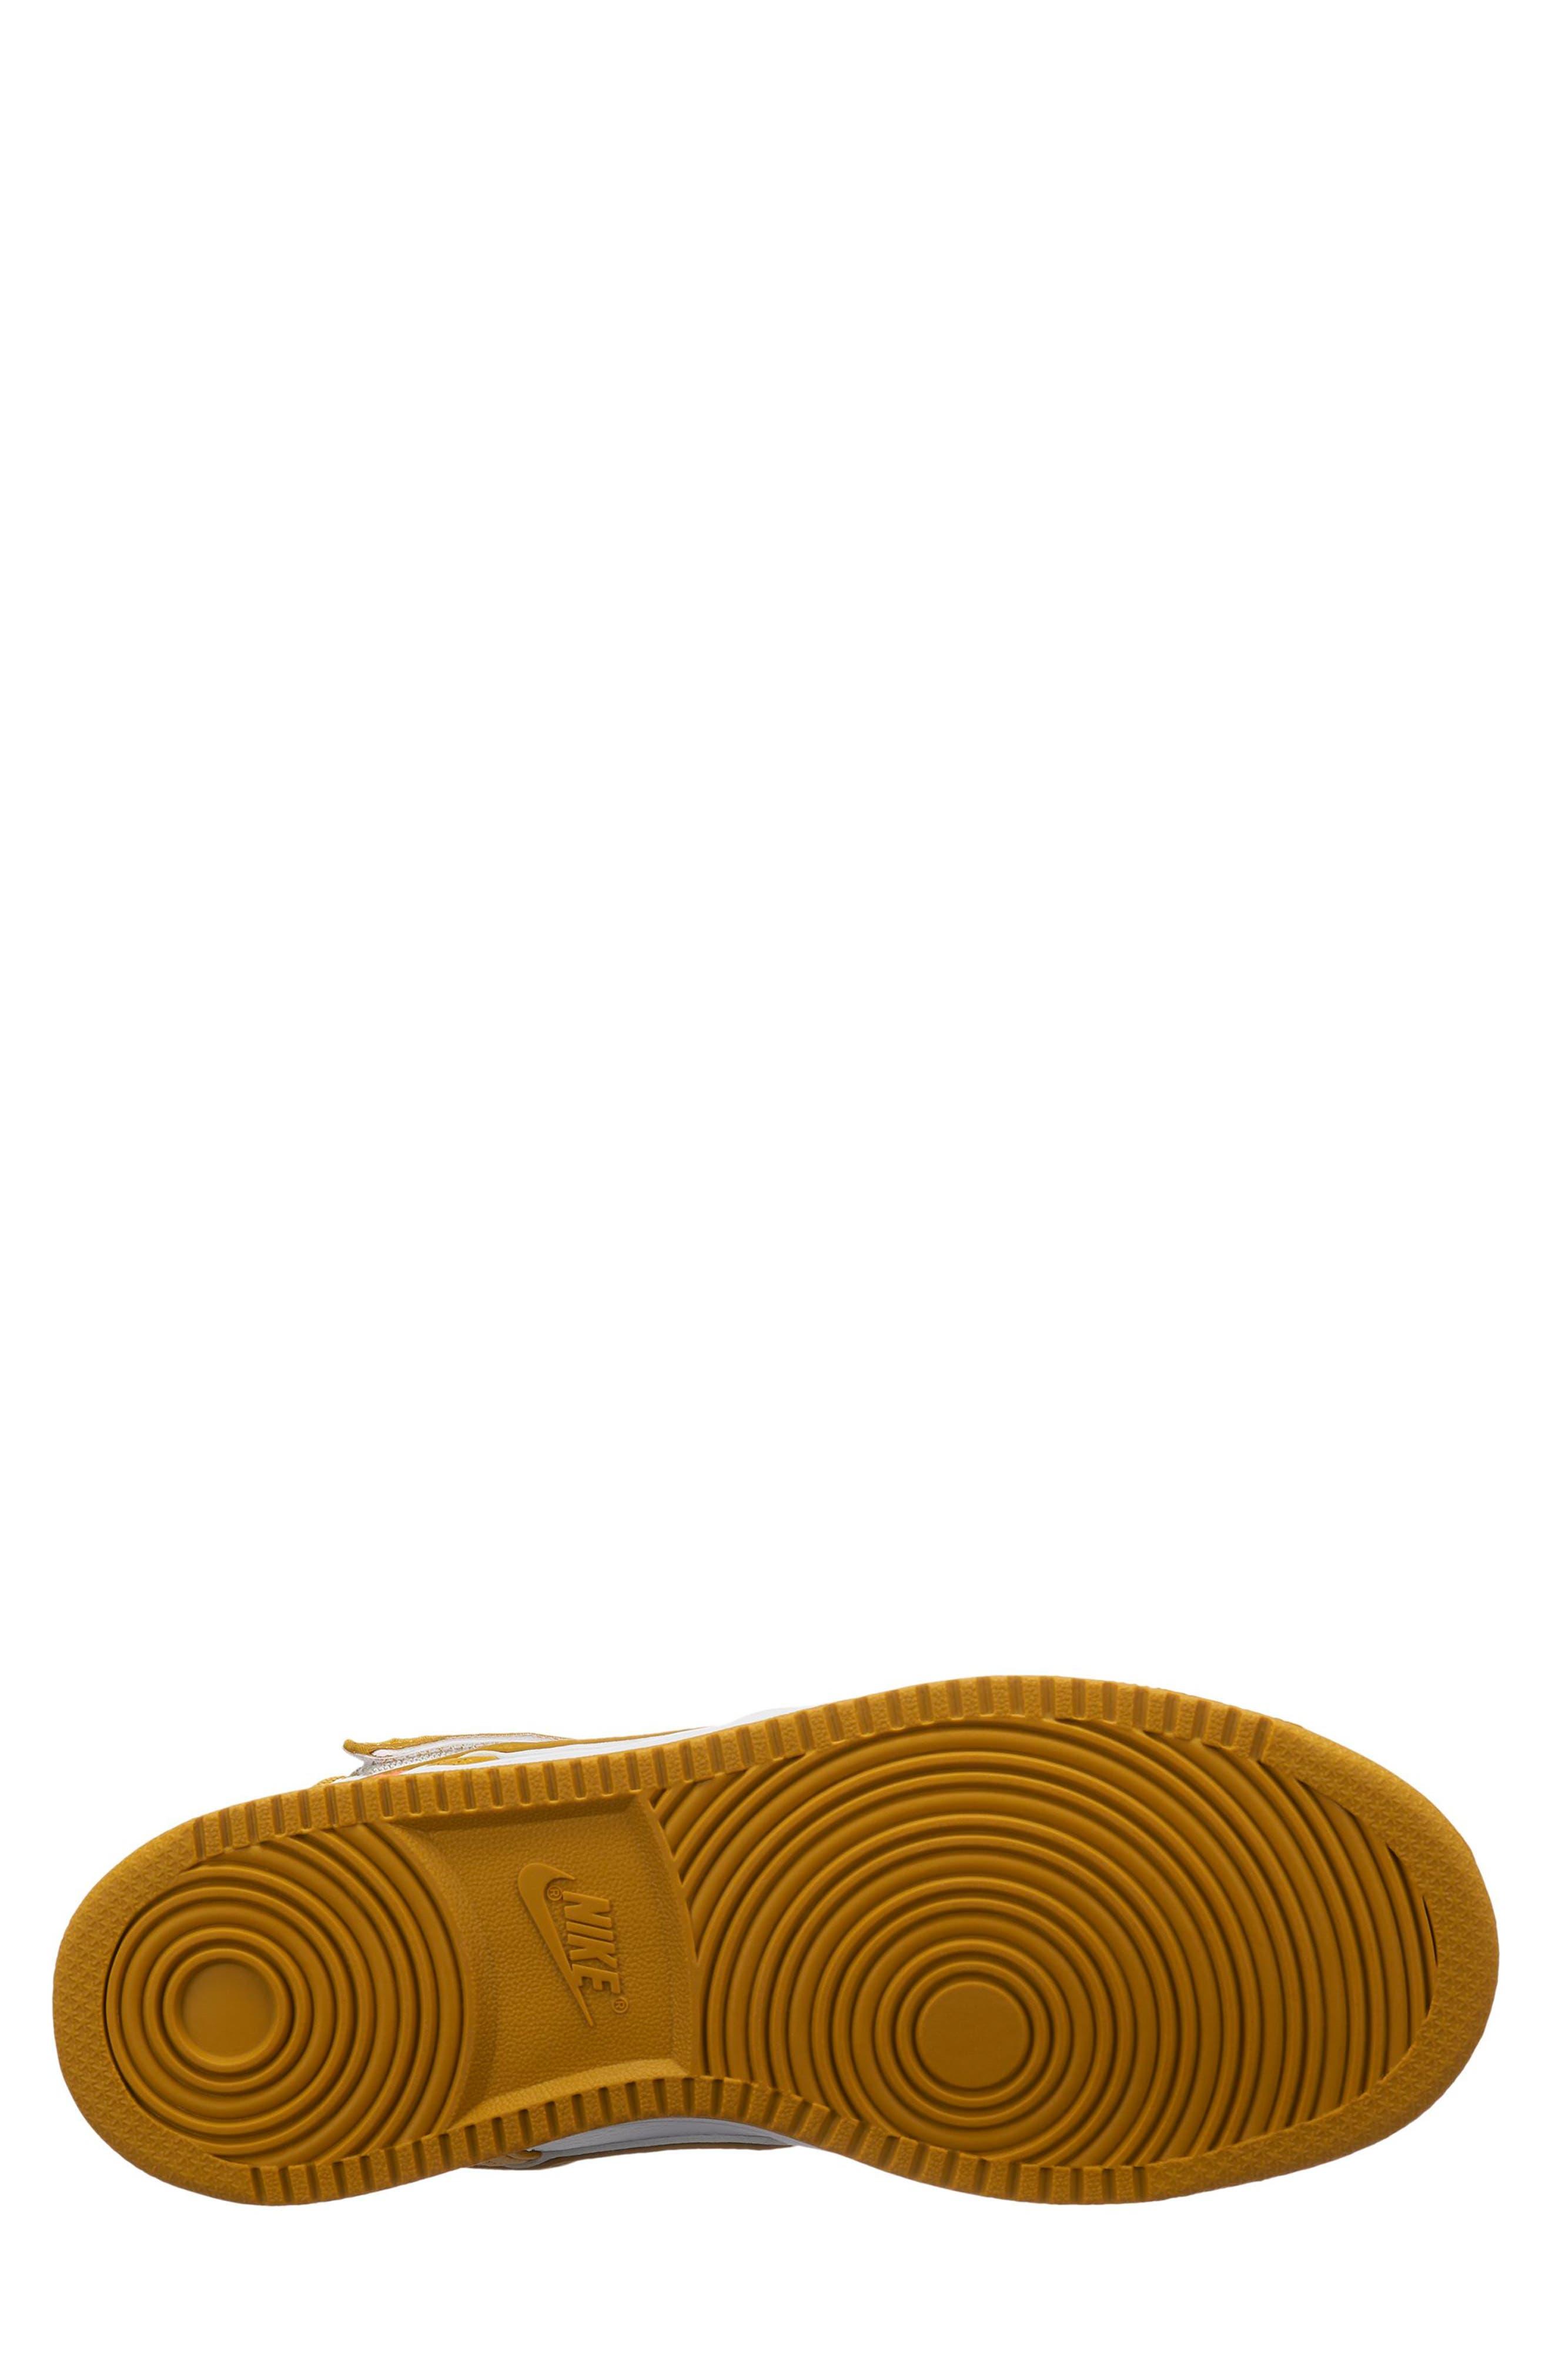 Vandal High Lux Sneaker,                             Alternate thumbnail 2, color,                             WHITE/ CITRON/ TWILIGHT PULSE